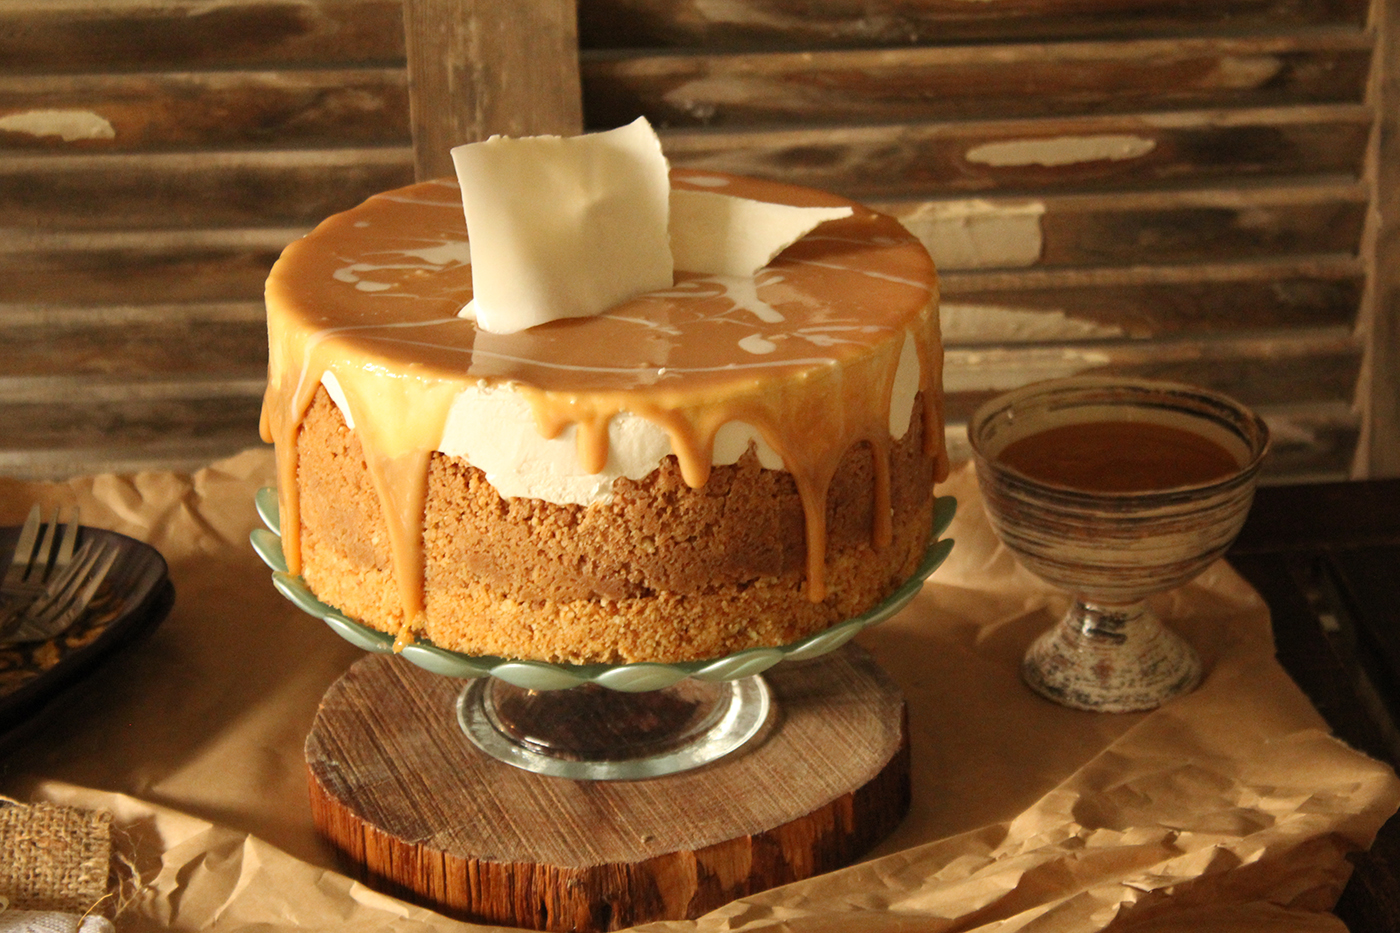 IMG 8321 - עוגת גבינה בציפוי ריבת חלב